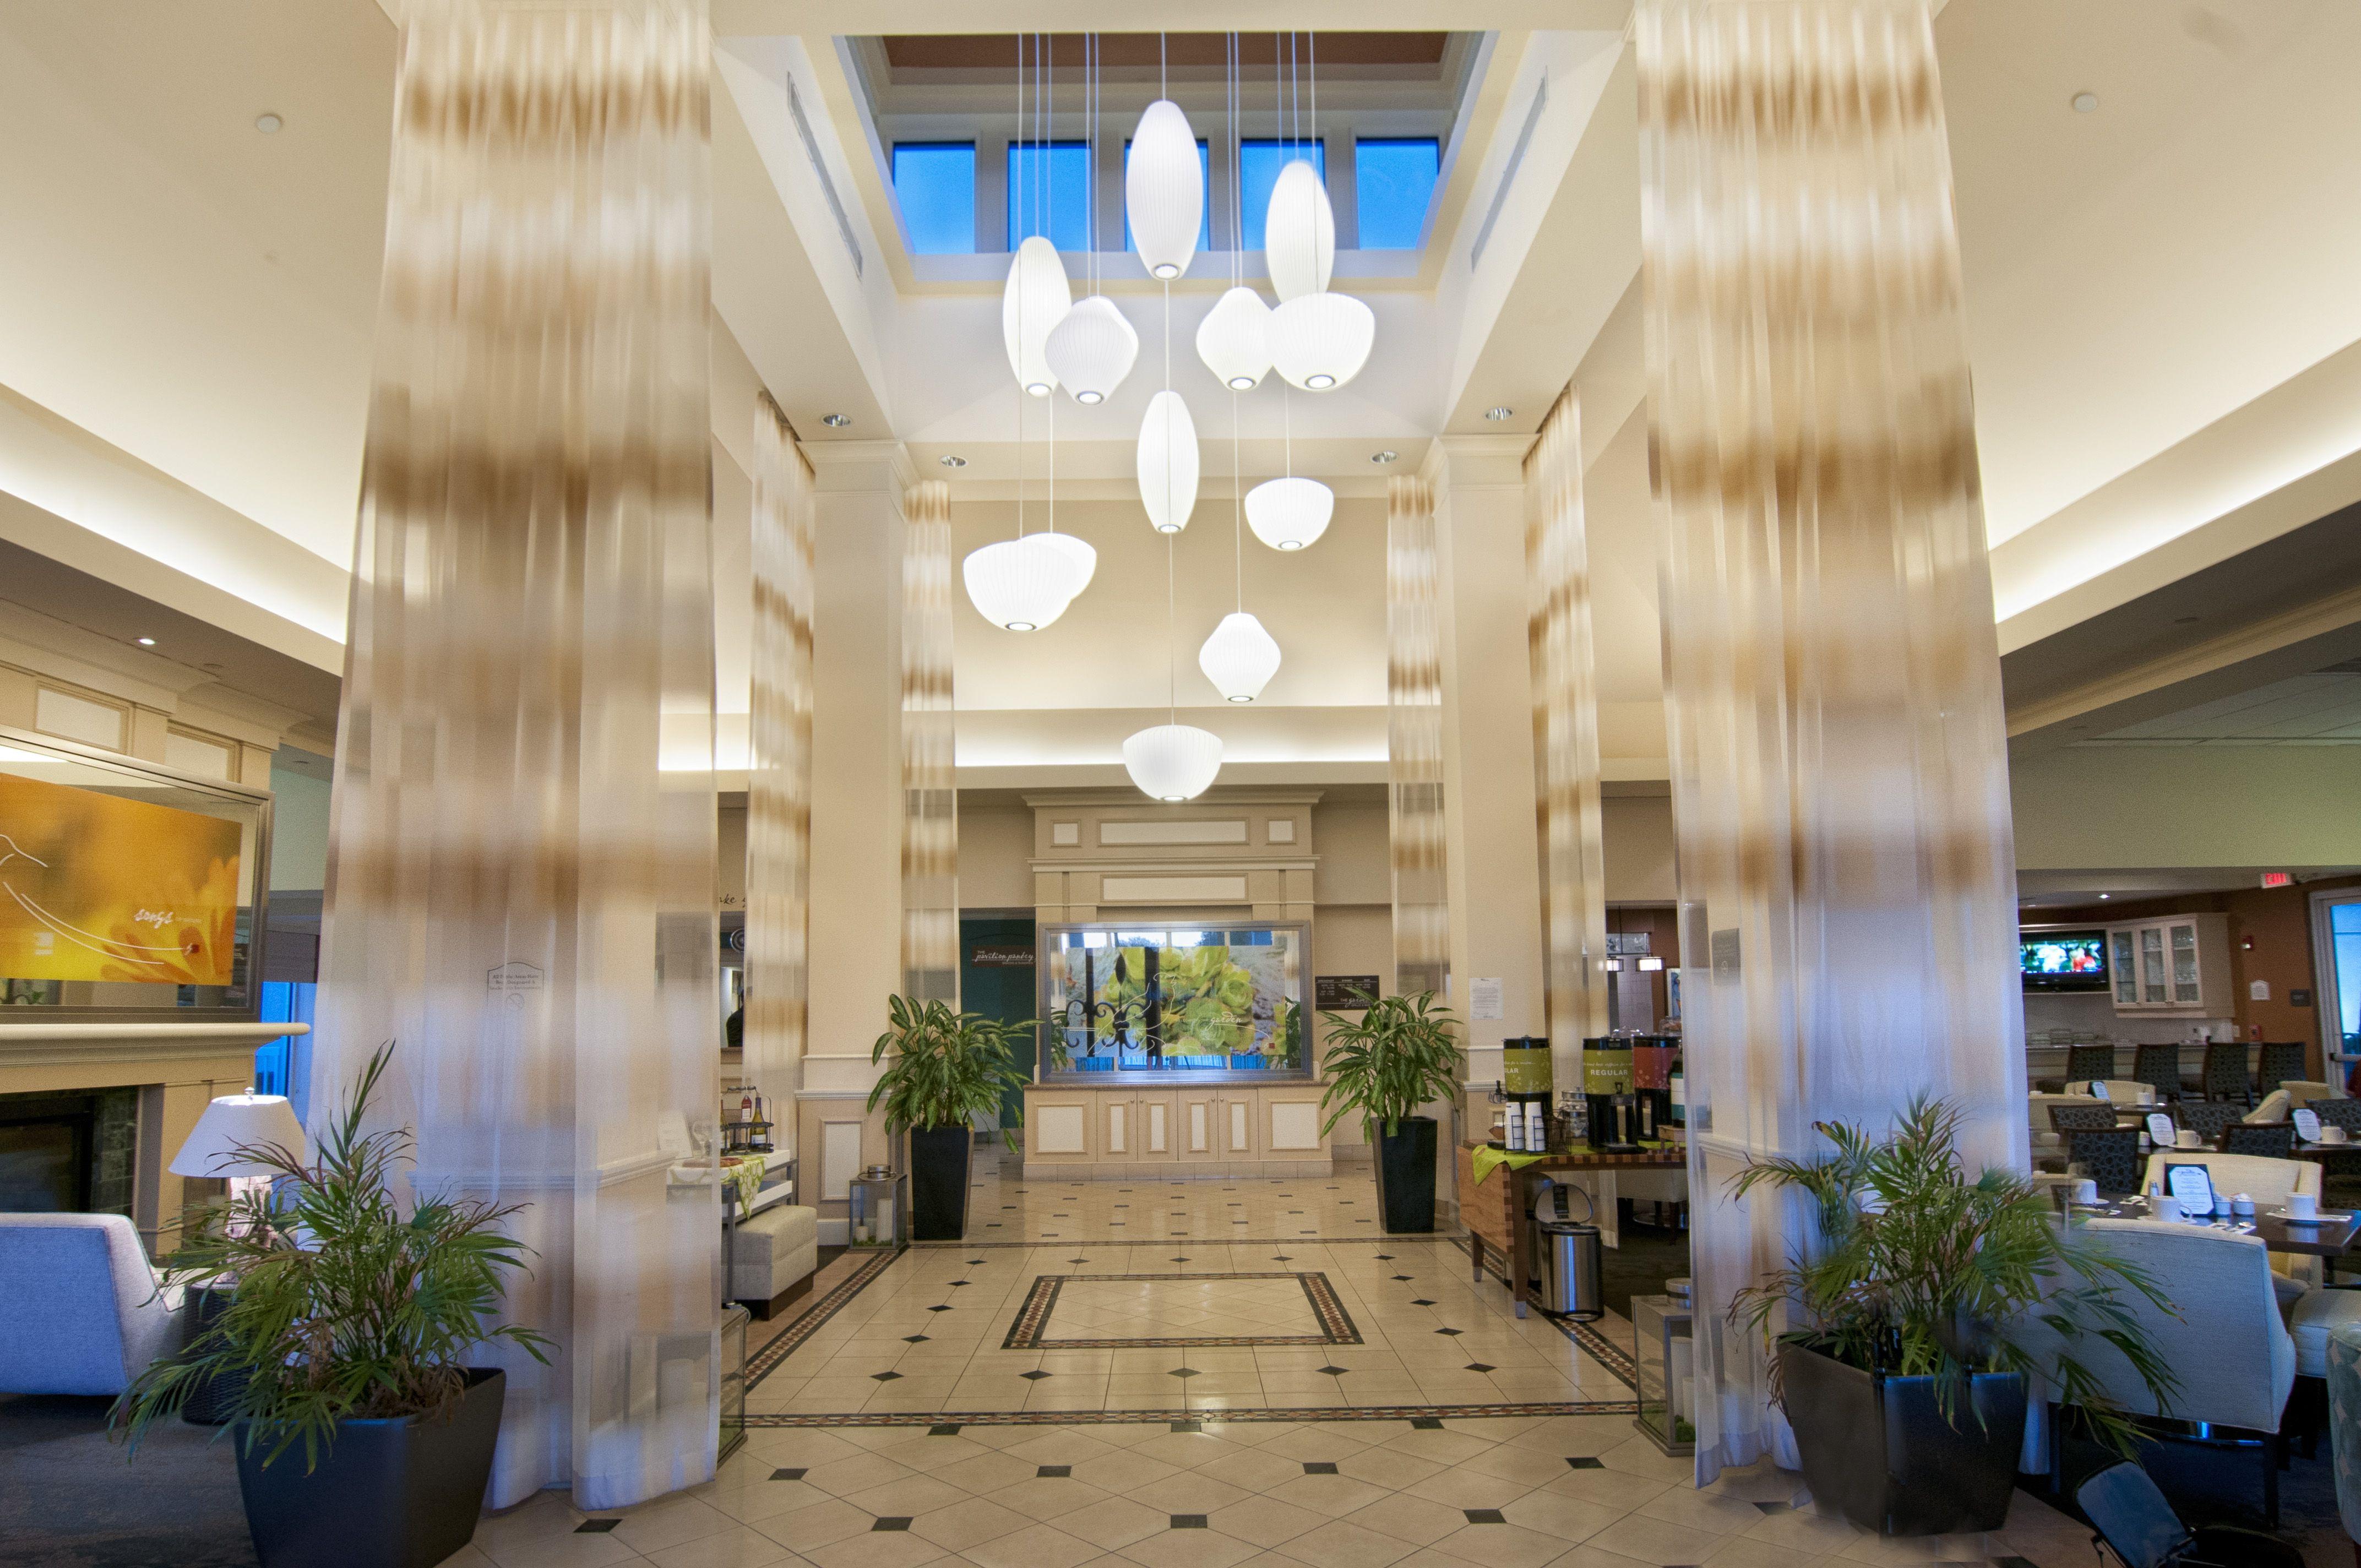 Our Lobby At The Hilton Garden Inn Sarasota Bradenton Airport In Beautiful Sarasota Florida Hilton Garden Inn Florida Hotels Sarasota